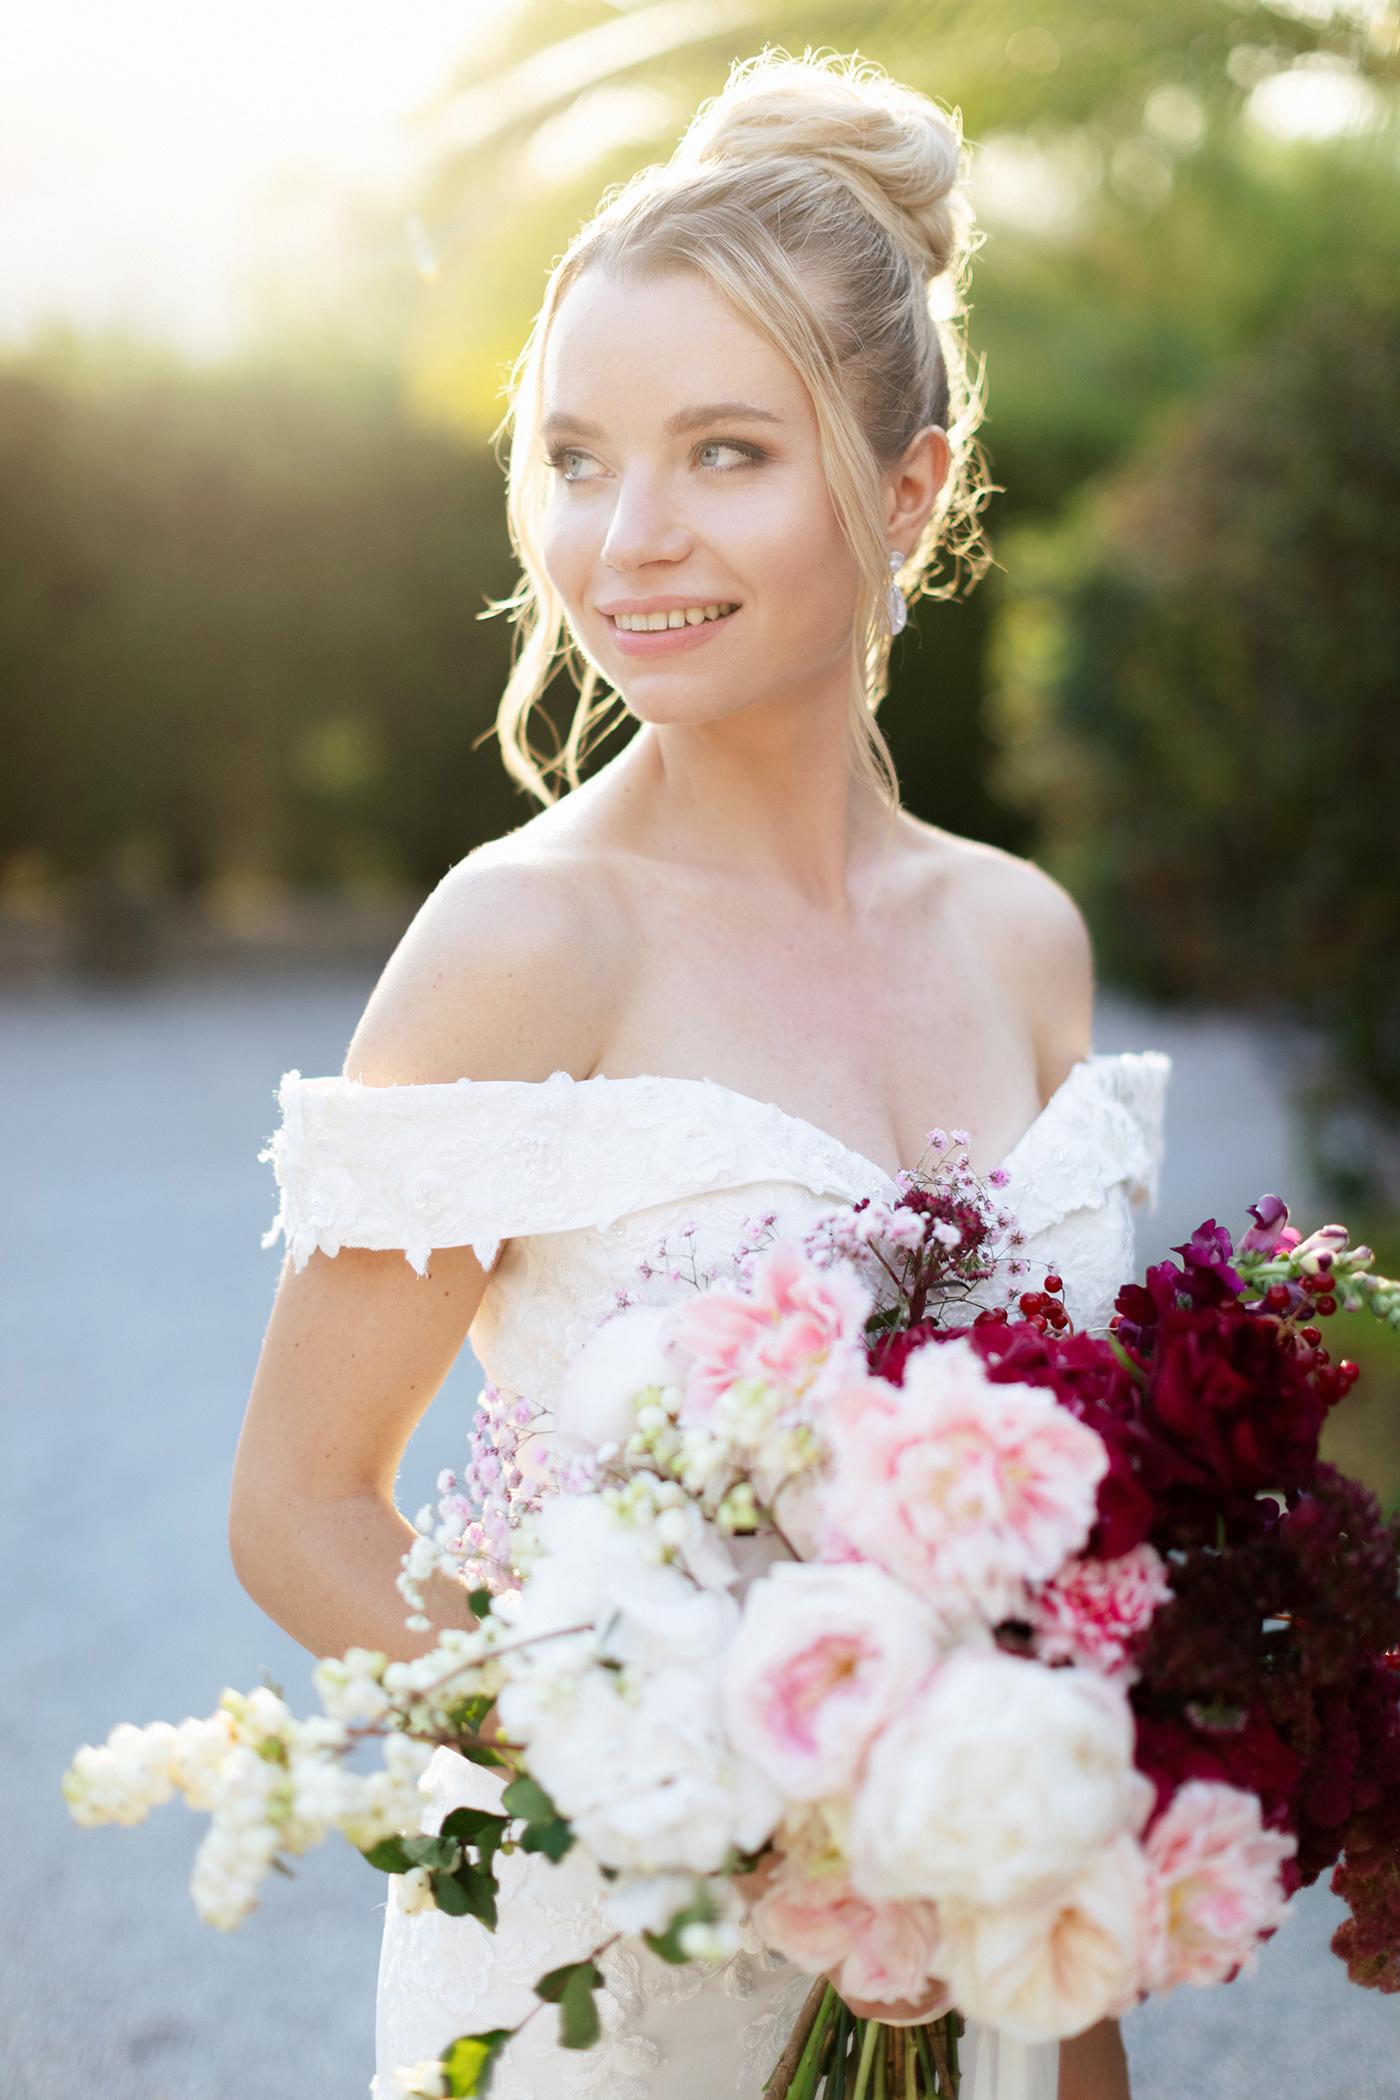 Picture perfect bridal makeup